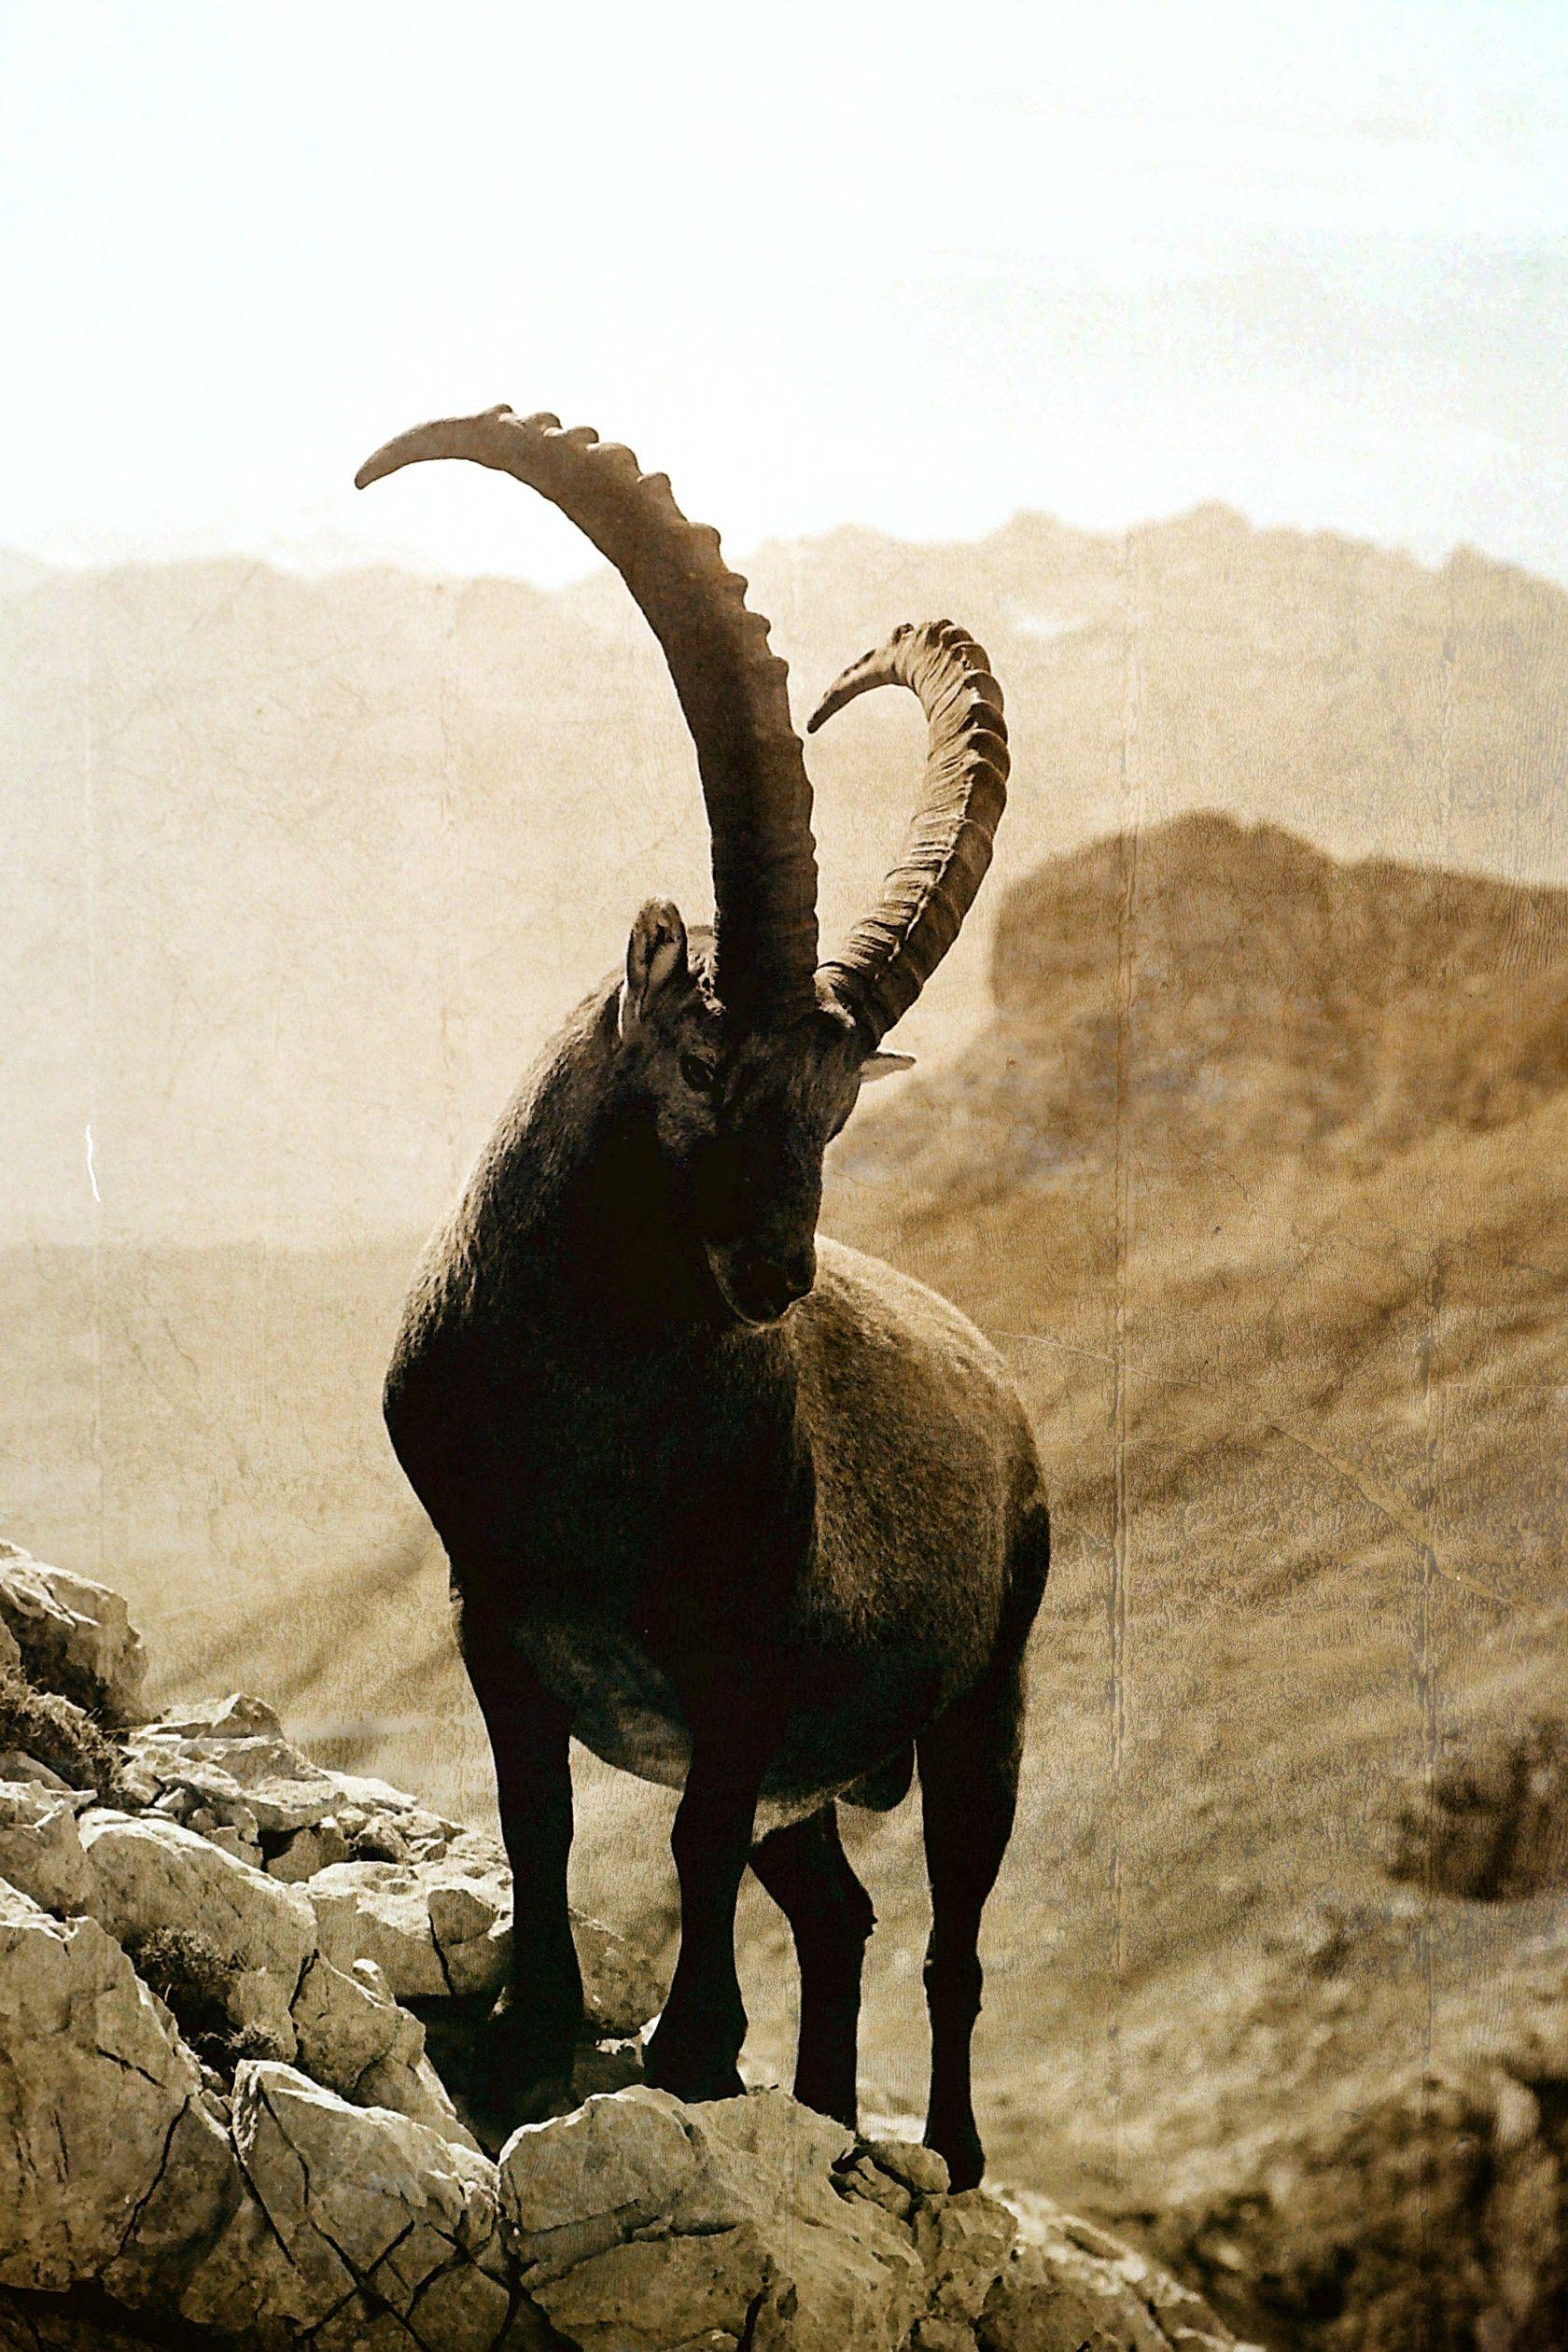 Pin by Tony Borgia on mountain goat   Hooved animal, Majestic animals,  Animals wild